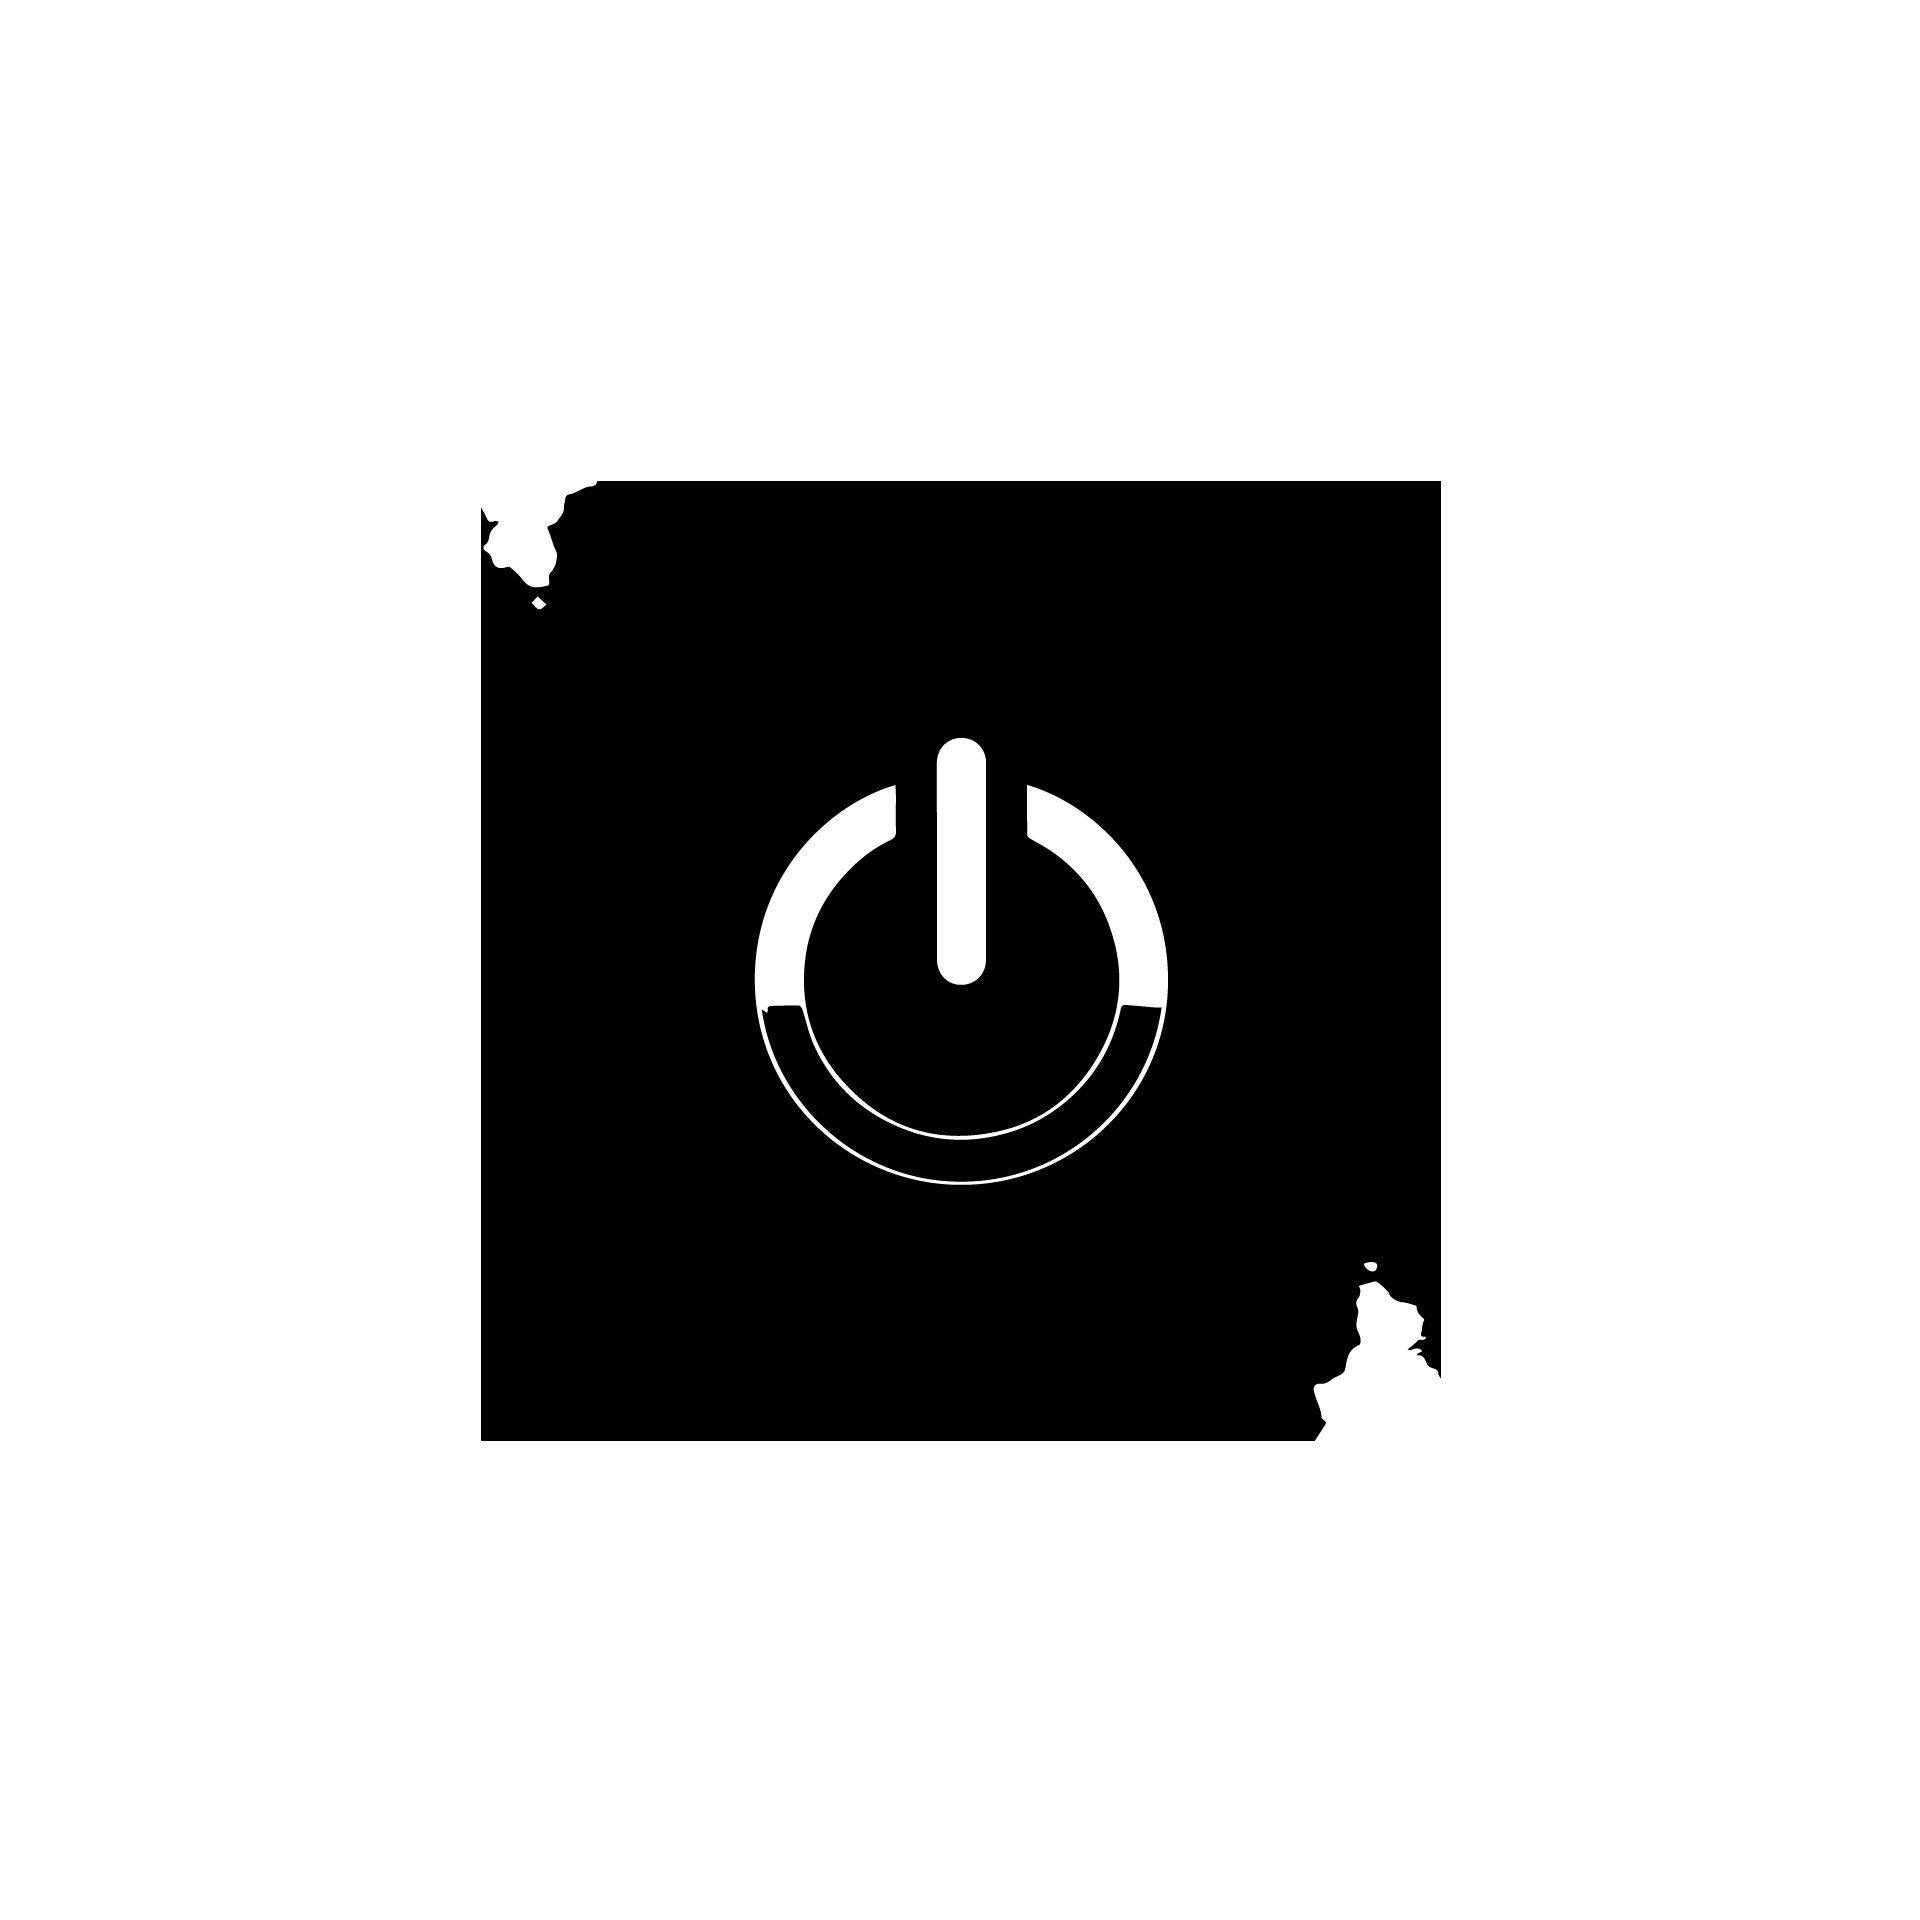 ADMark Logos 235136-23.jpg